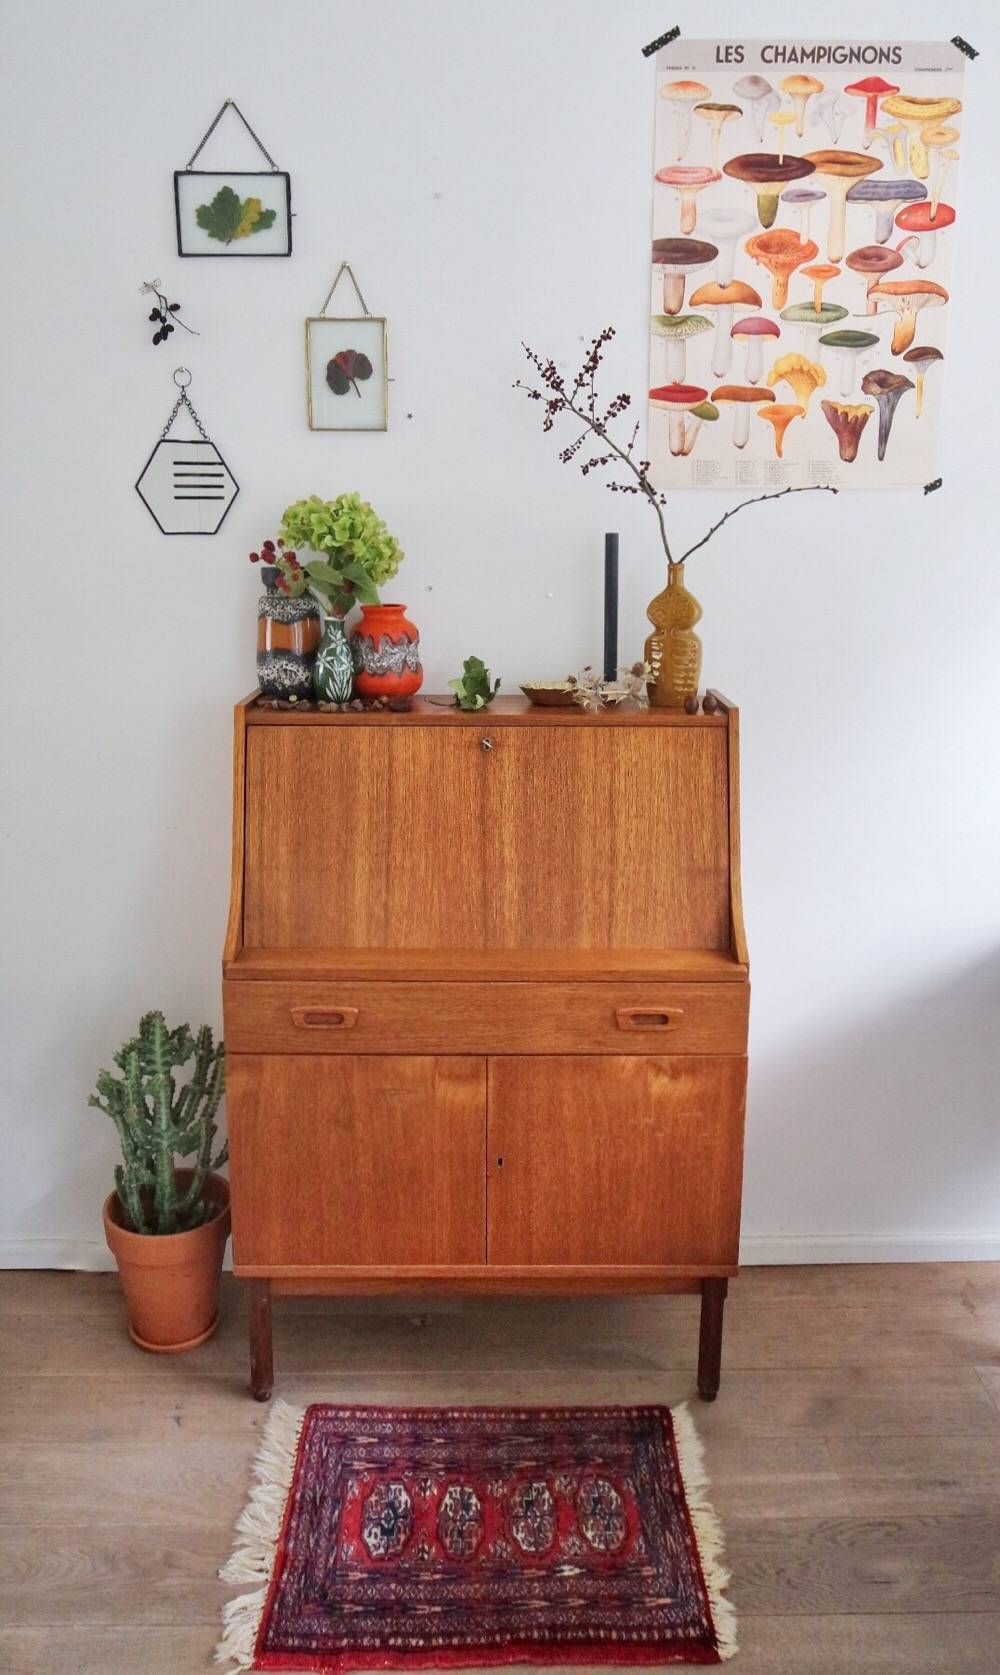 Diy een herfst tafereeltje voor grown ups humble abode pinterest - Idees decors du milieu du siecle salon ...